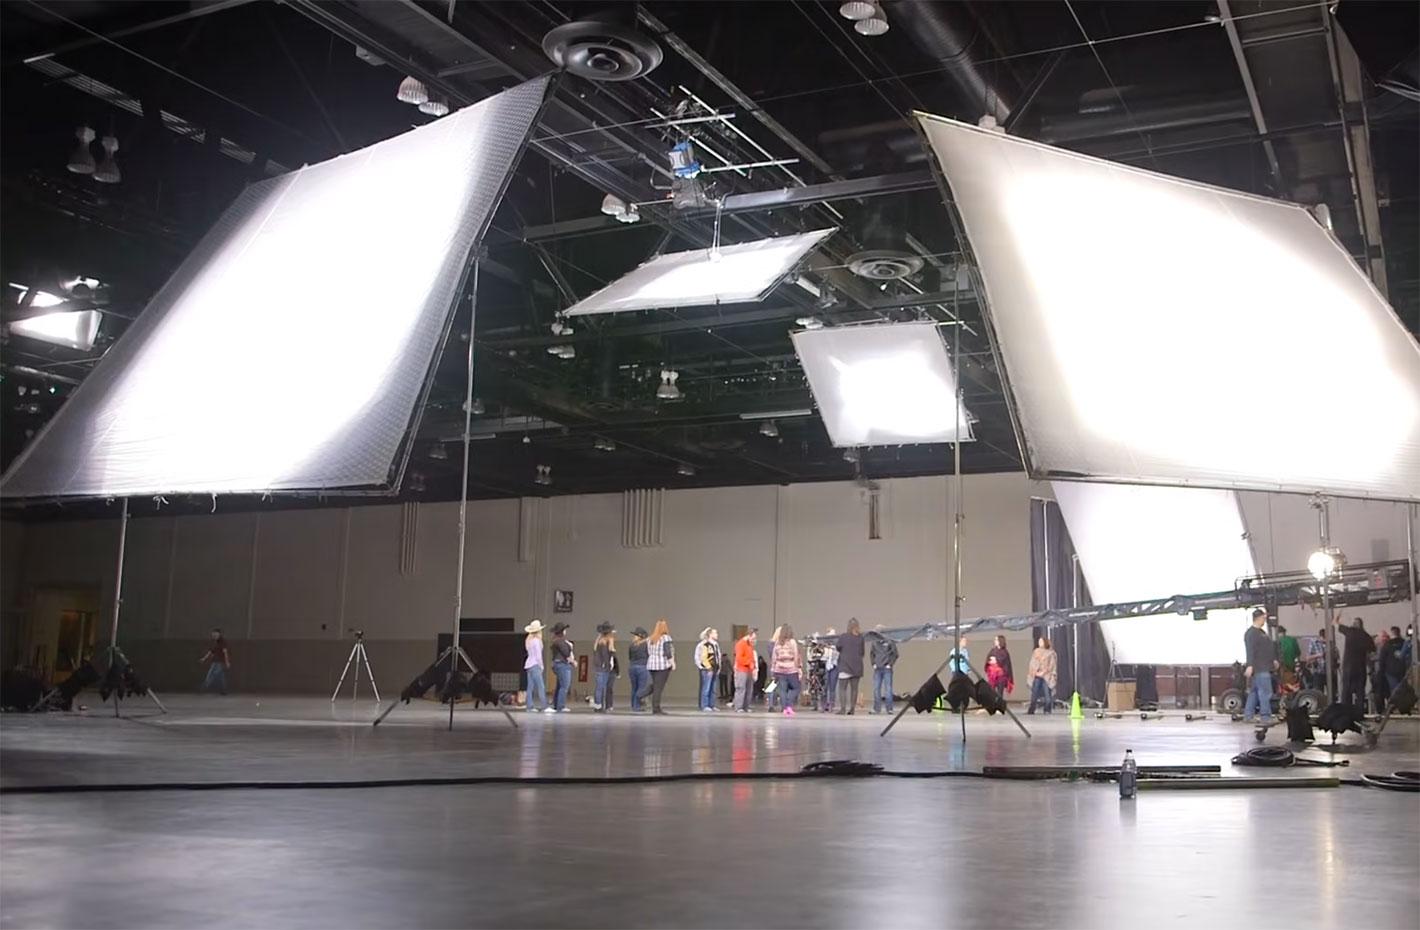 Behind The Scenes: The Making Of The Calgary Stampede Selfie